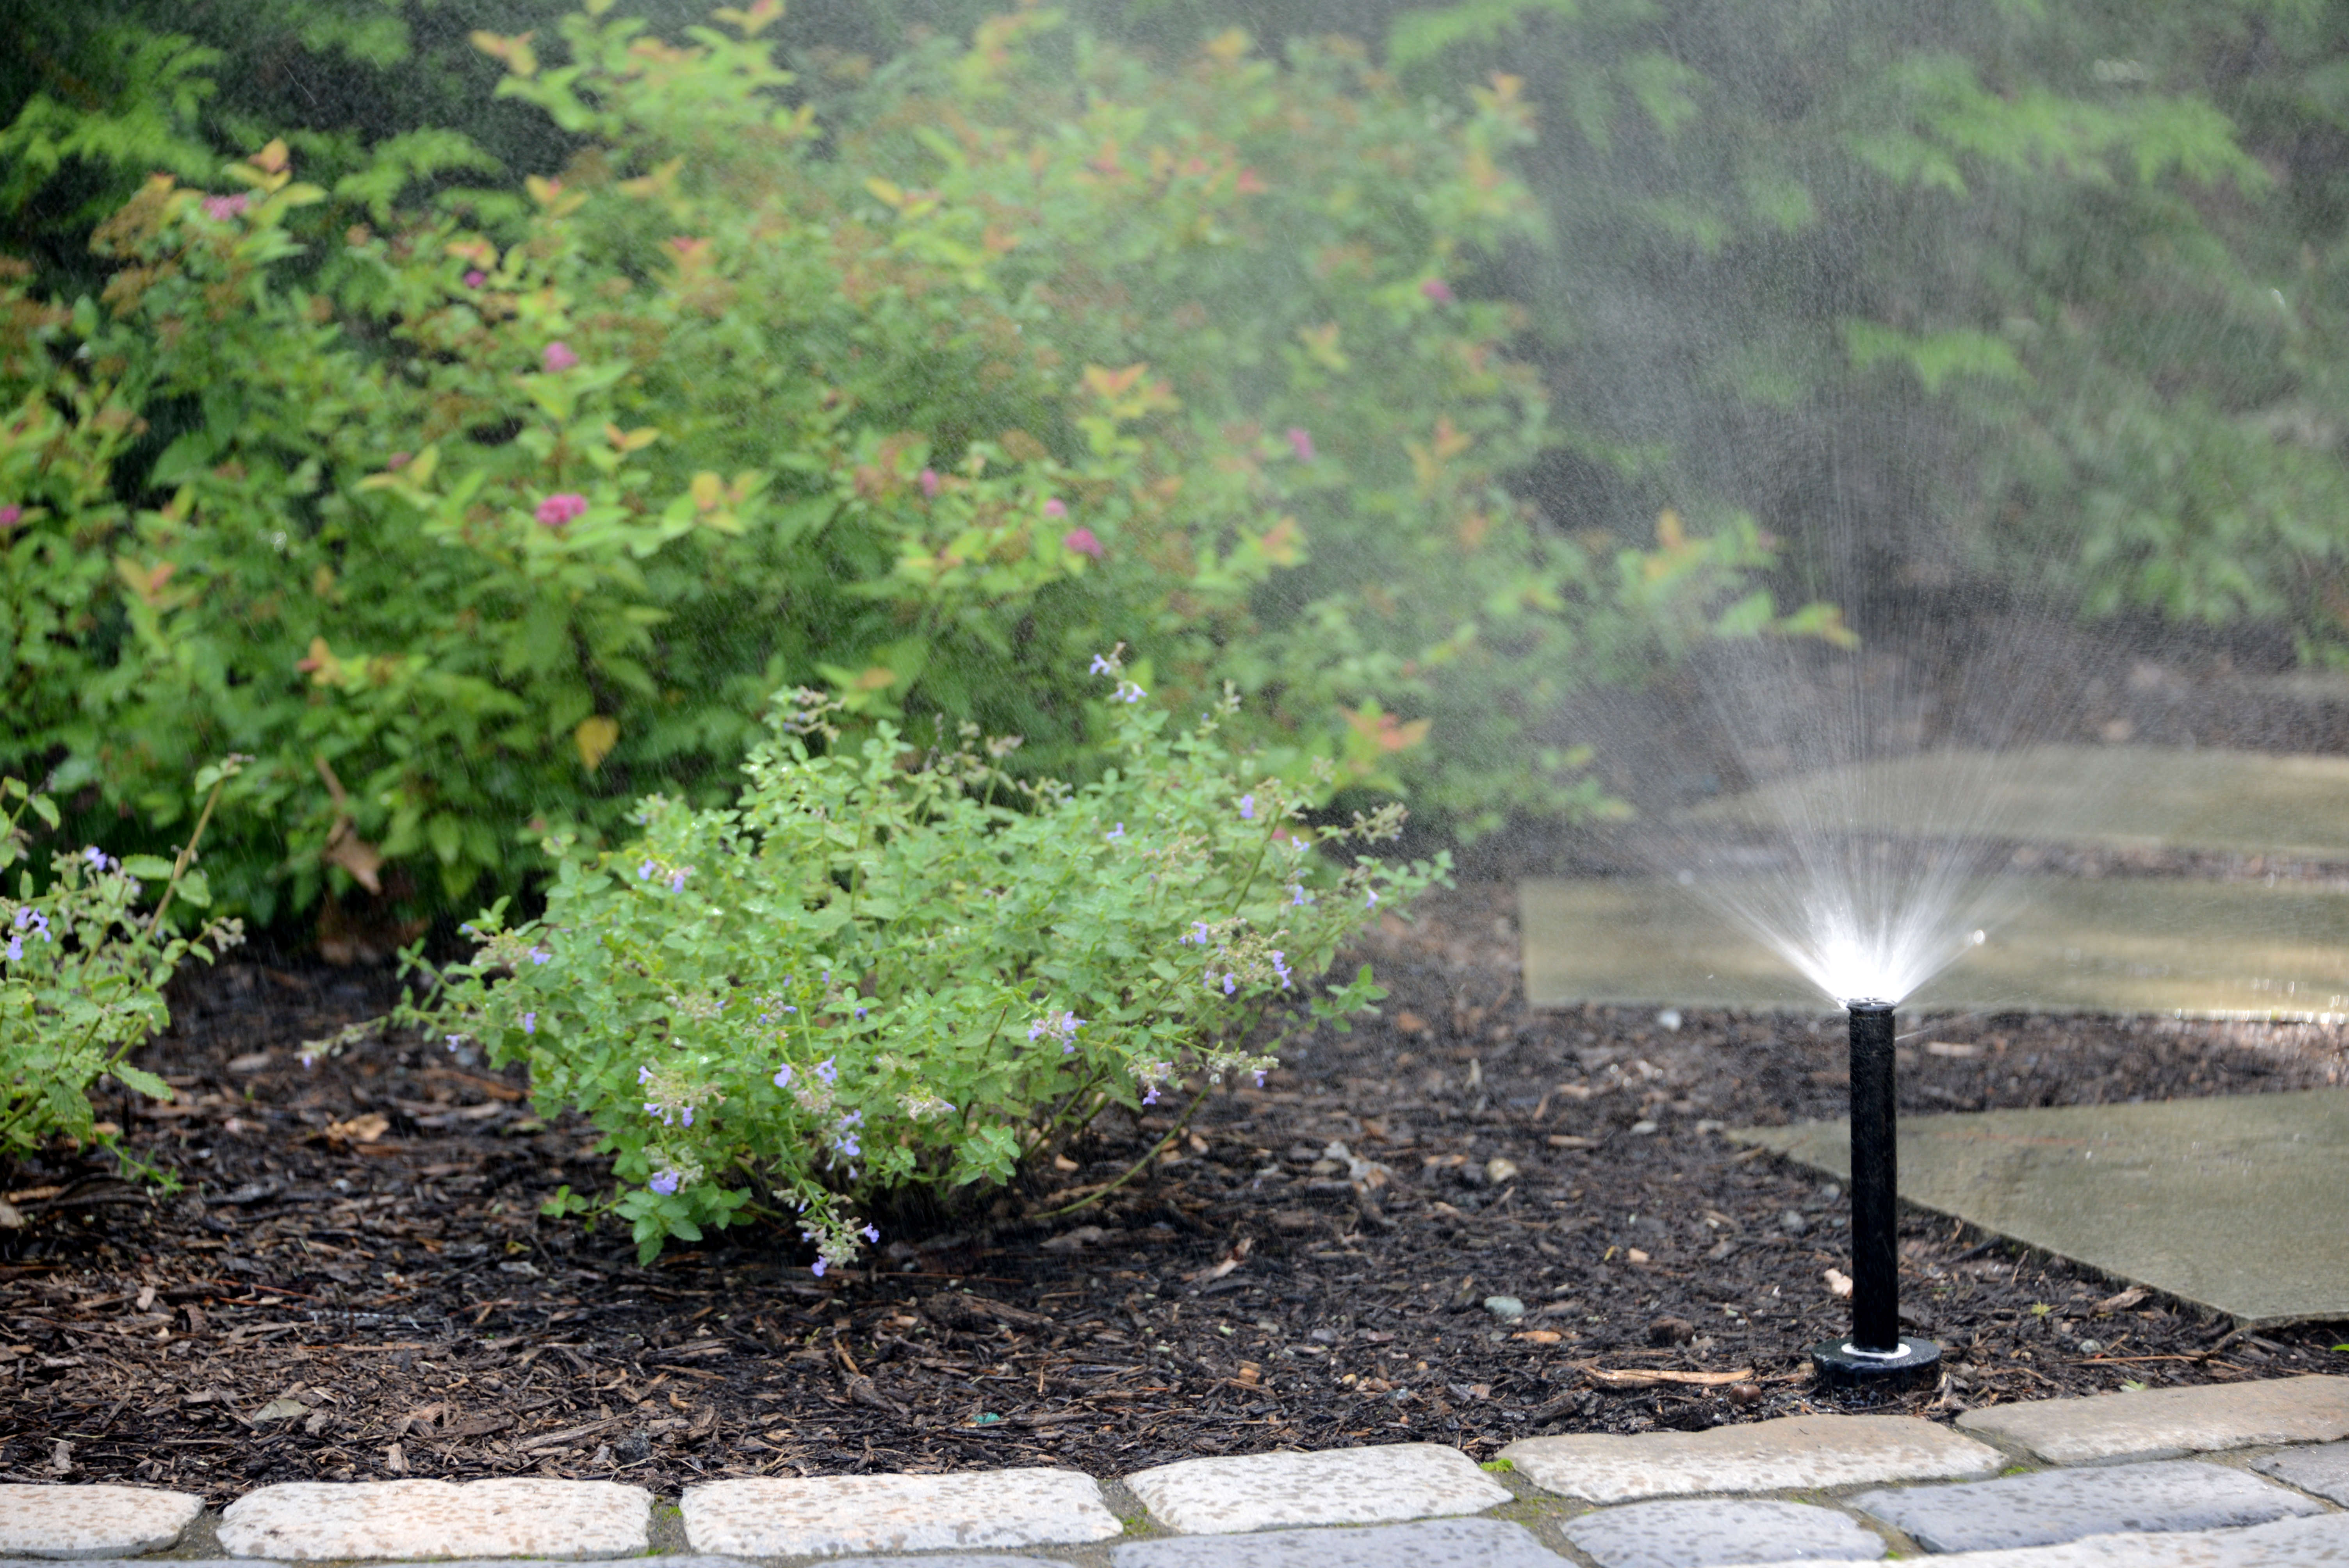 Sprinkler system with plantings